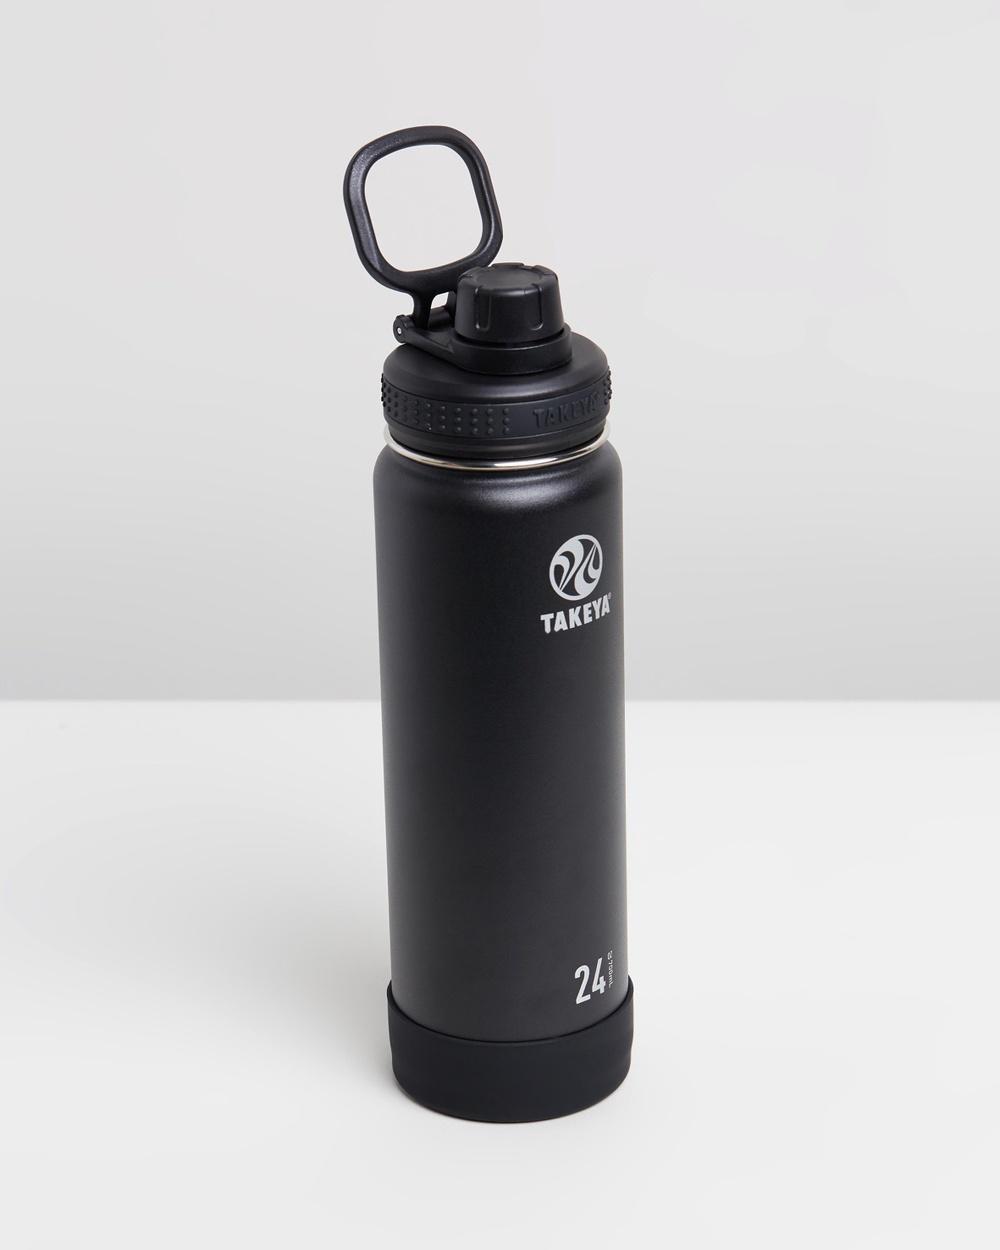 TAKEYA 700ml Insulated Stainless Steel Bottle 24oz Water Bottles Onyx